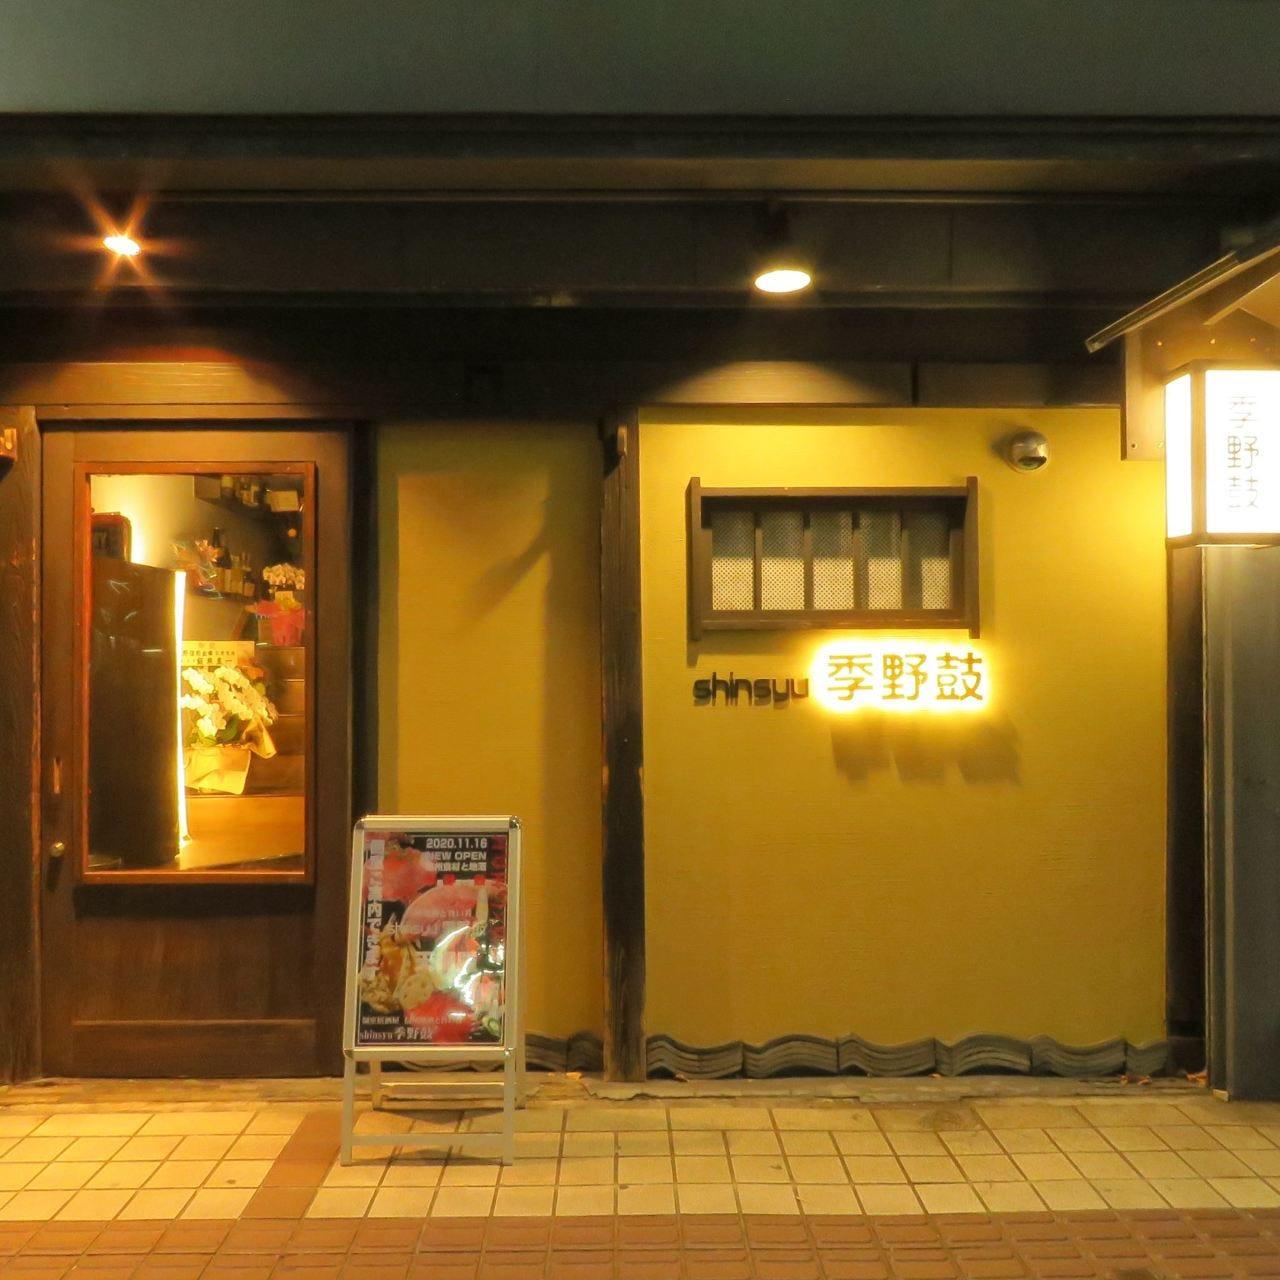 shinsyu 季野鼓